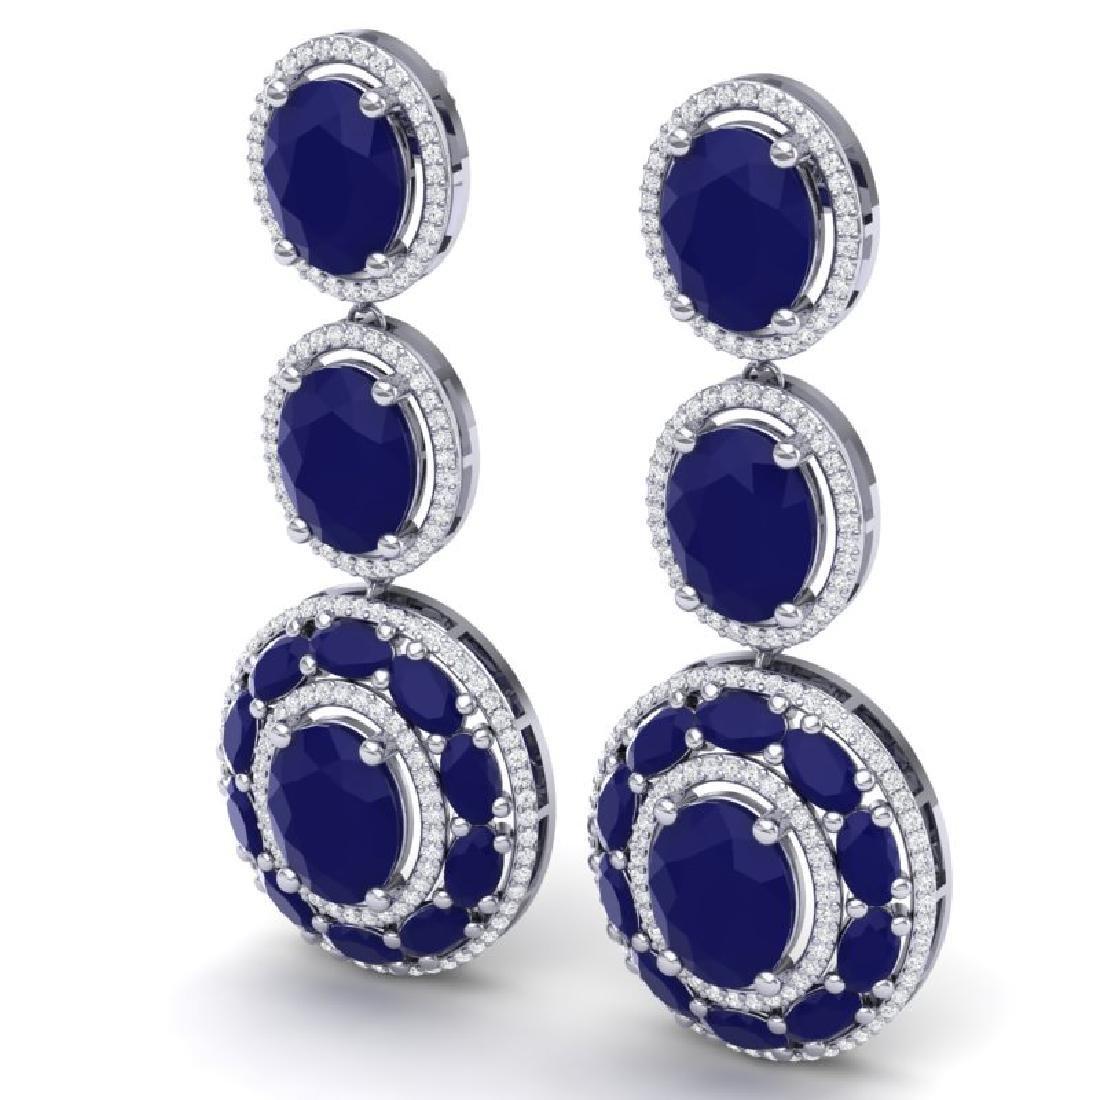 32.84 CTW Royalty Sapphire & VS Diamond Earrings 18K - 2